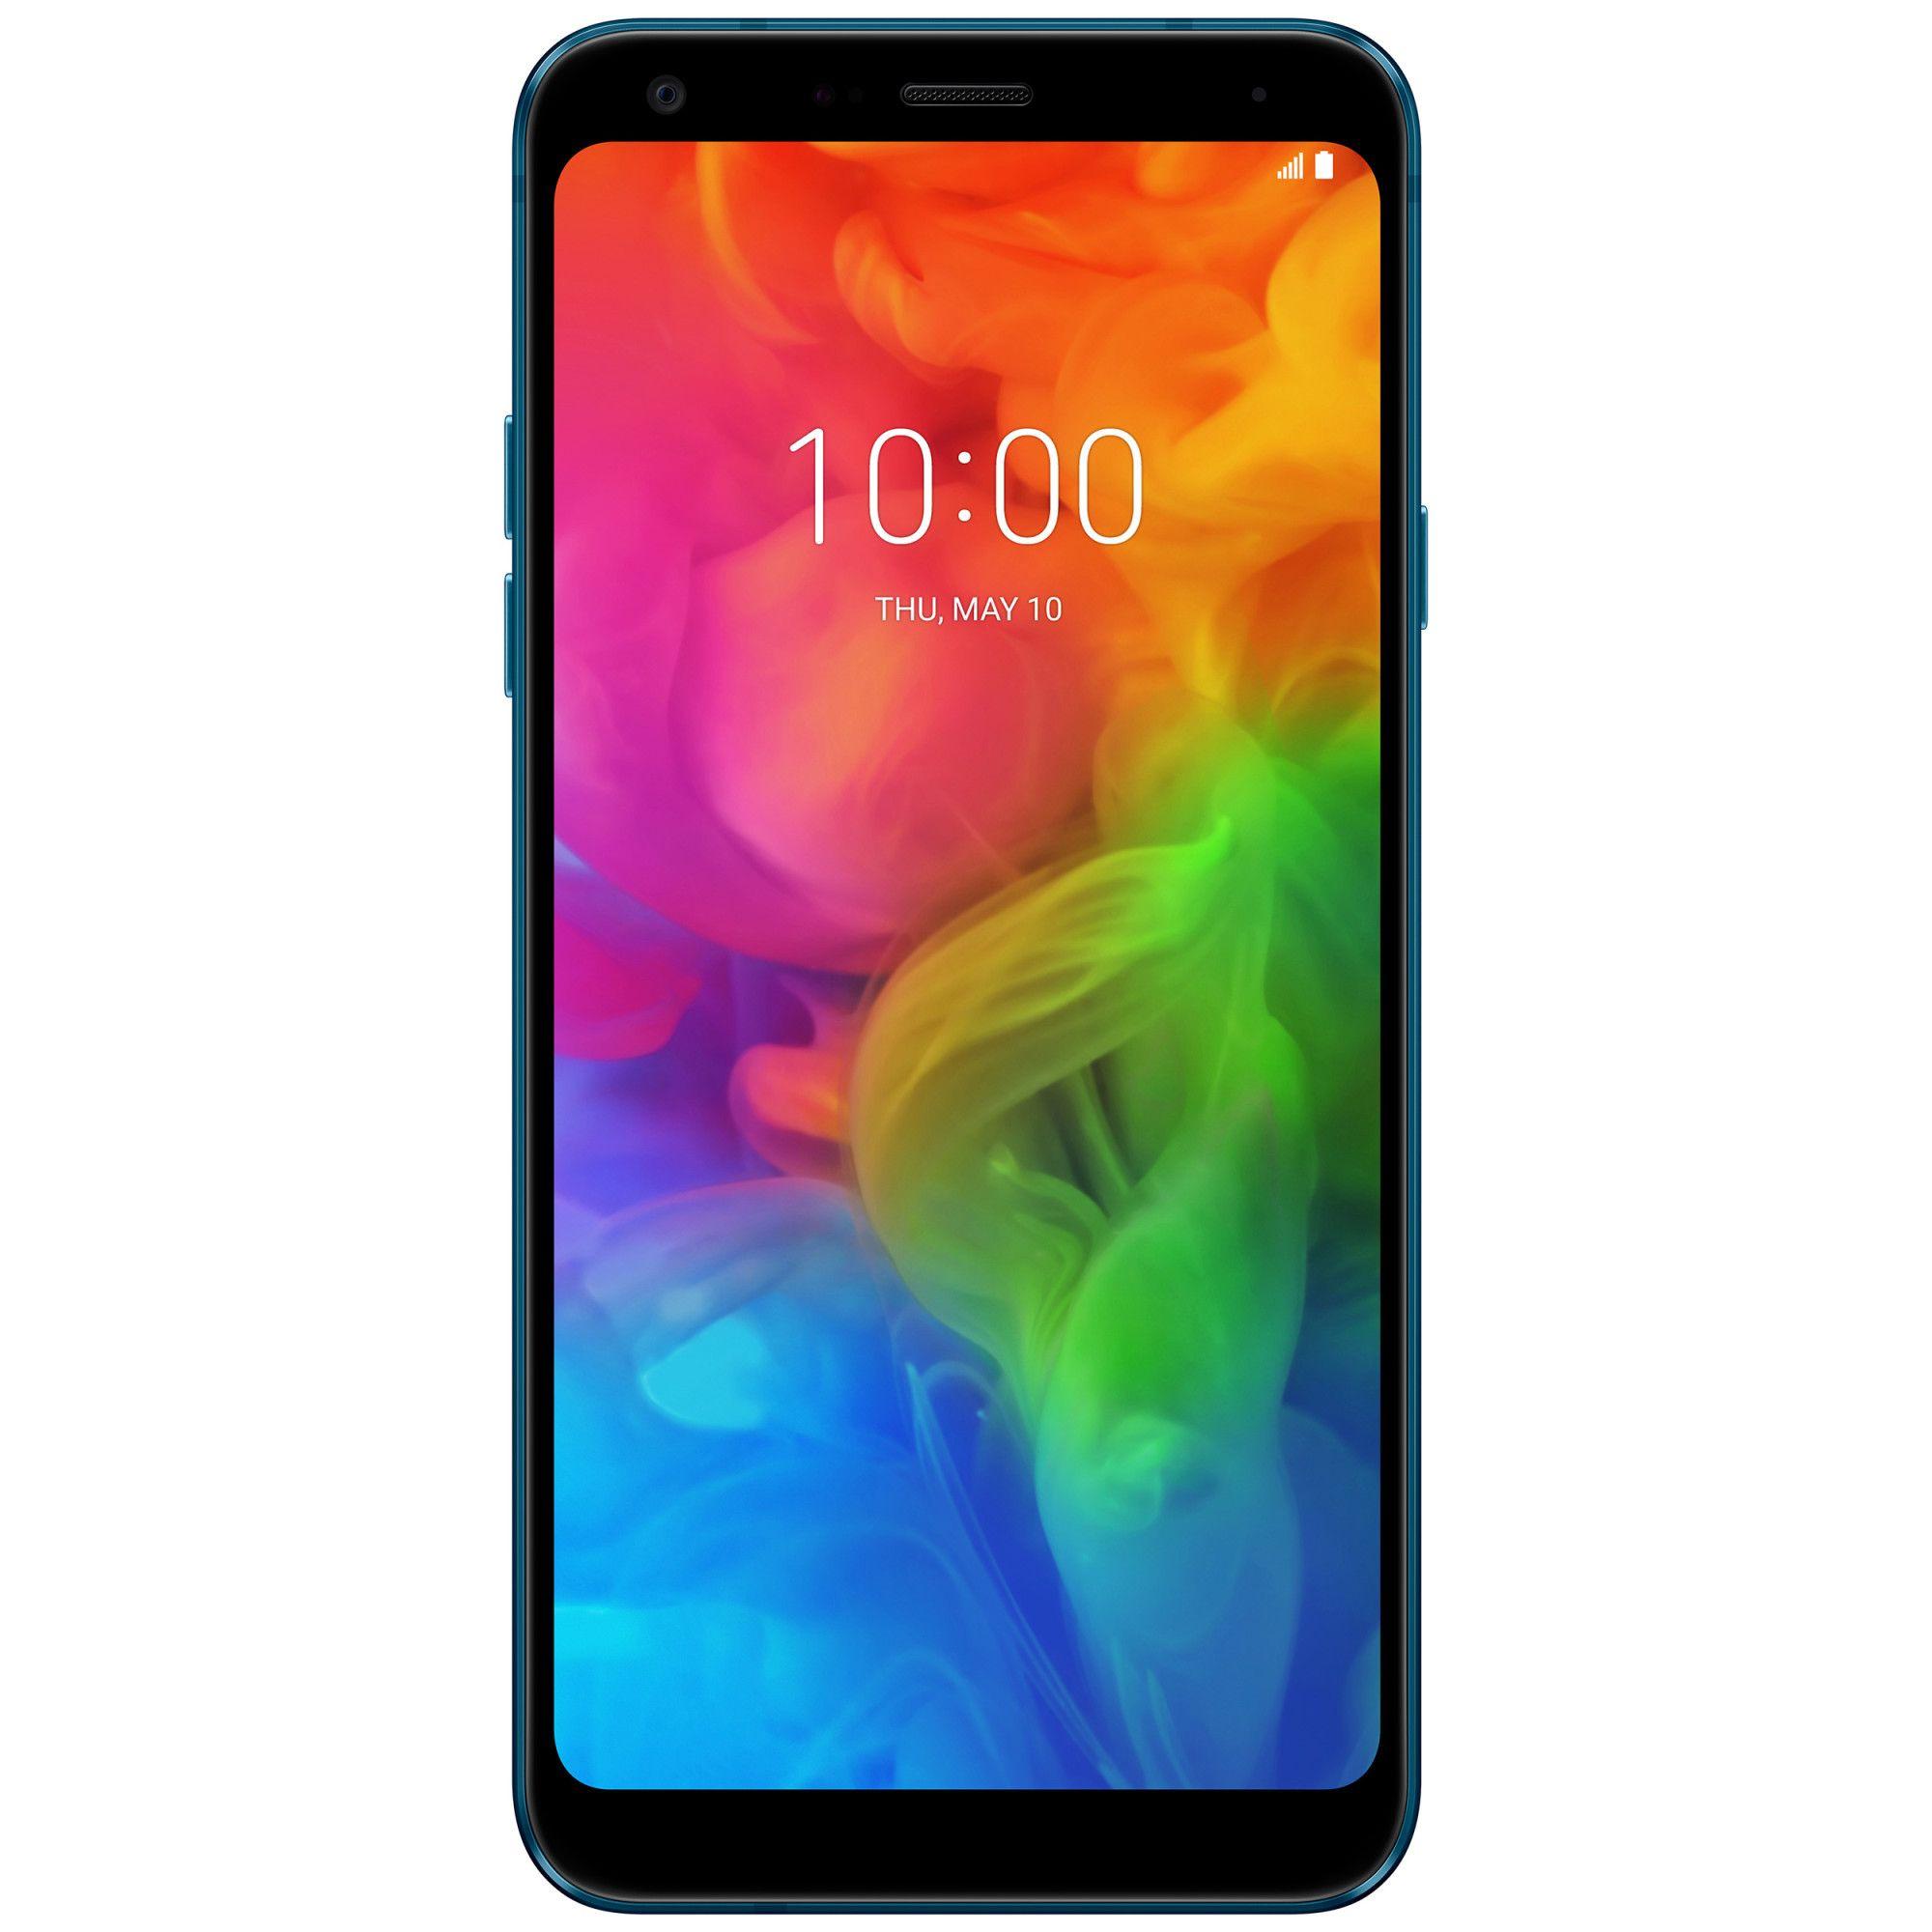 Telefon mobil Telefon mobil LG Q7, Single SIM, 32GB, 3GB RAM, Blue